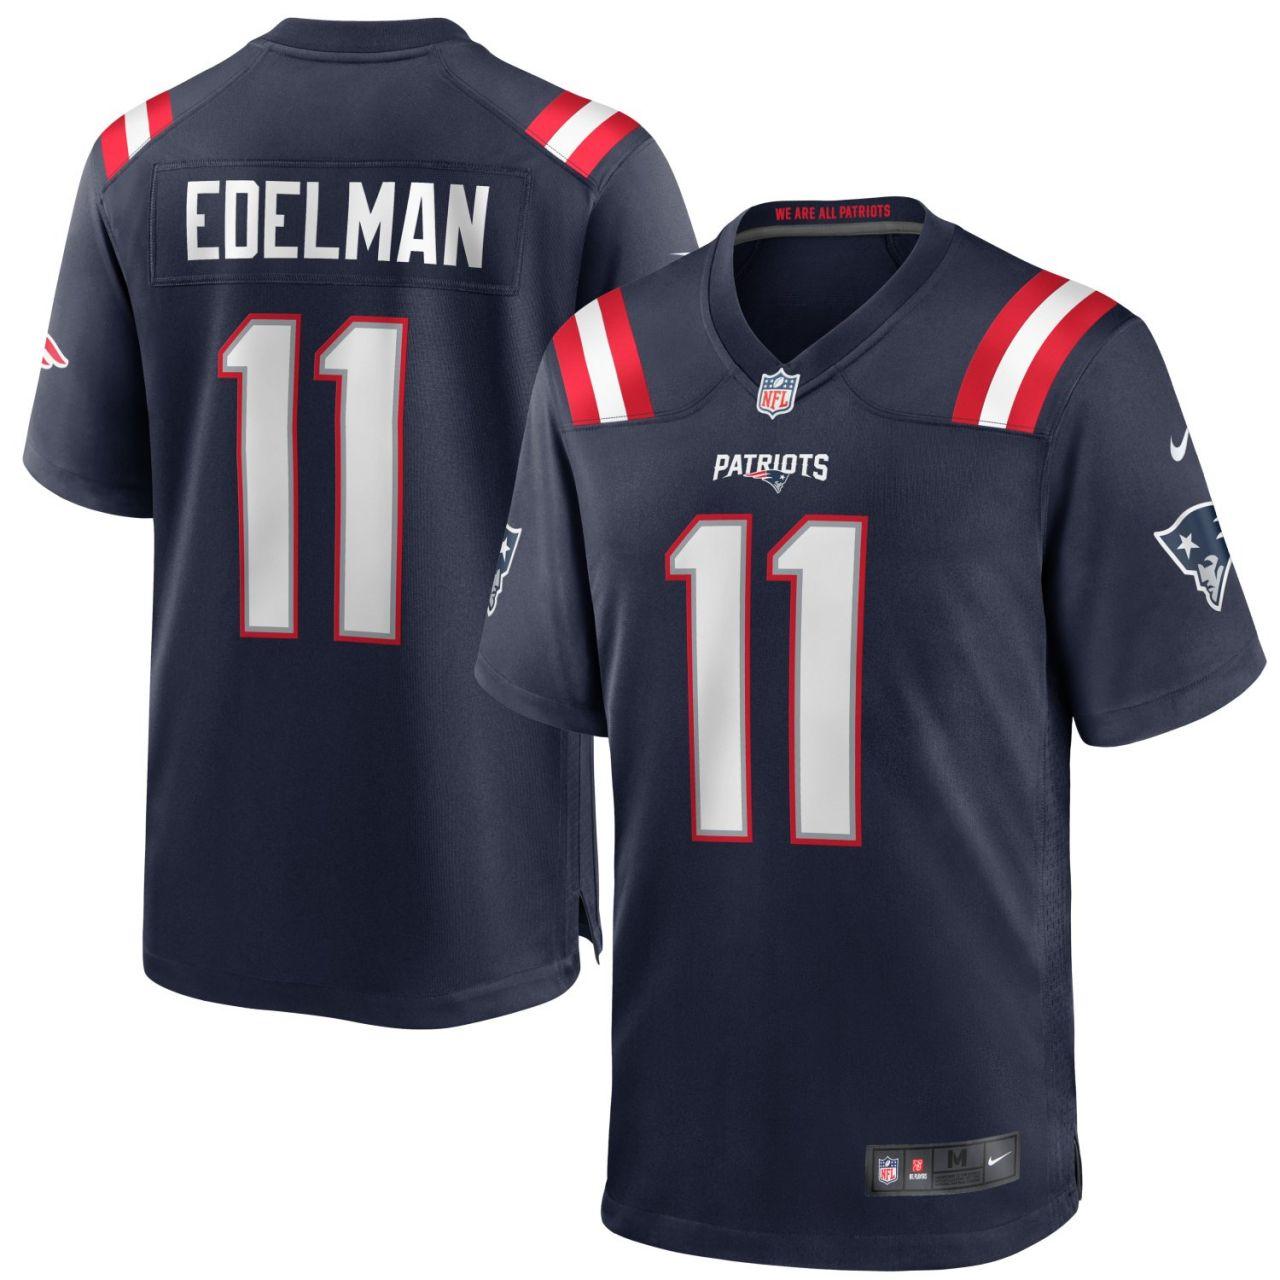 amfoo - Nike GAME Jersey New England Patriots #11 Julian Edelman